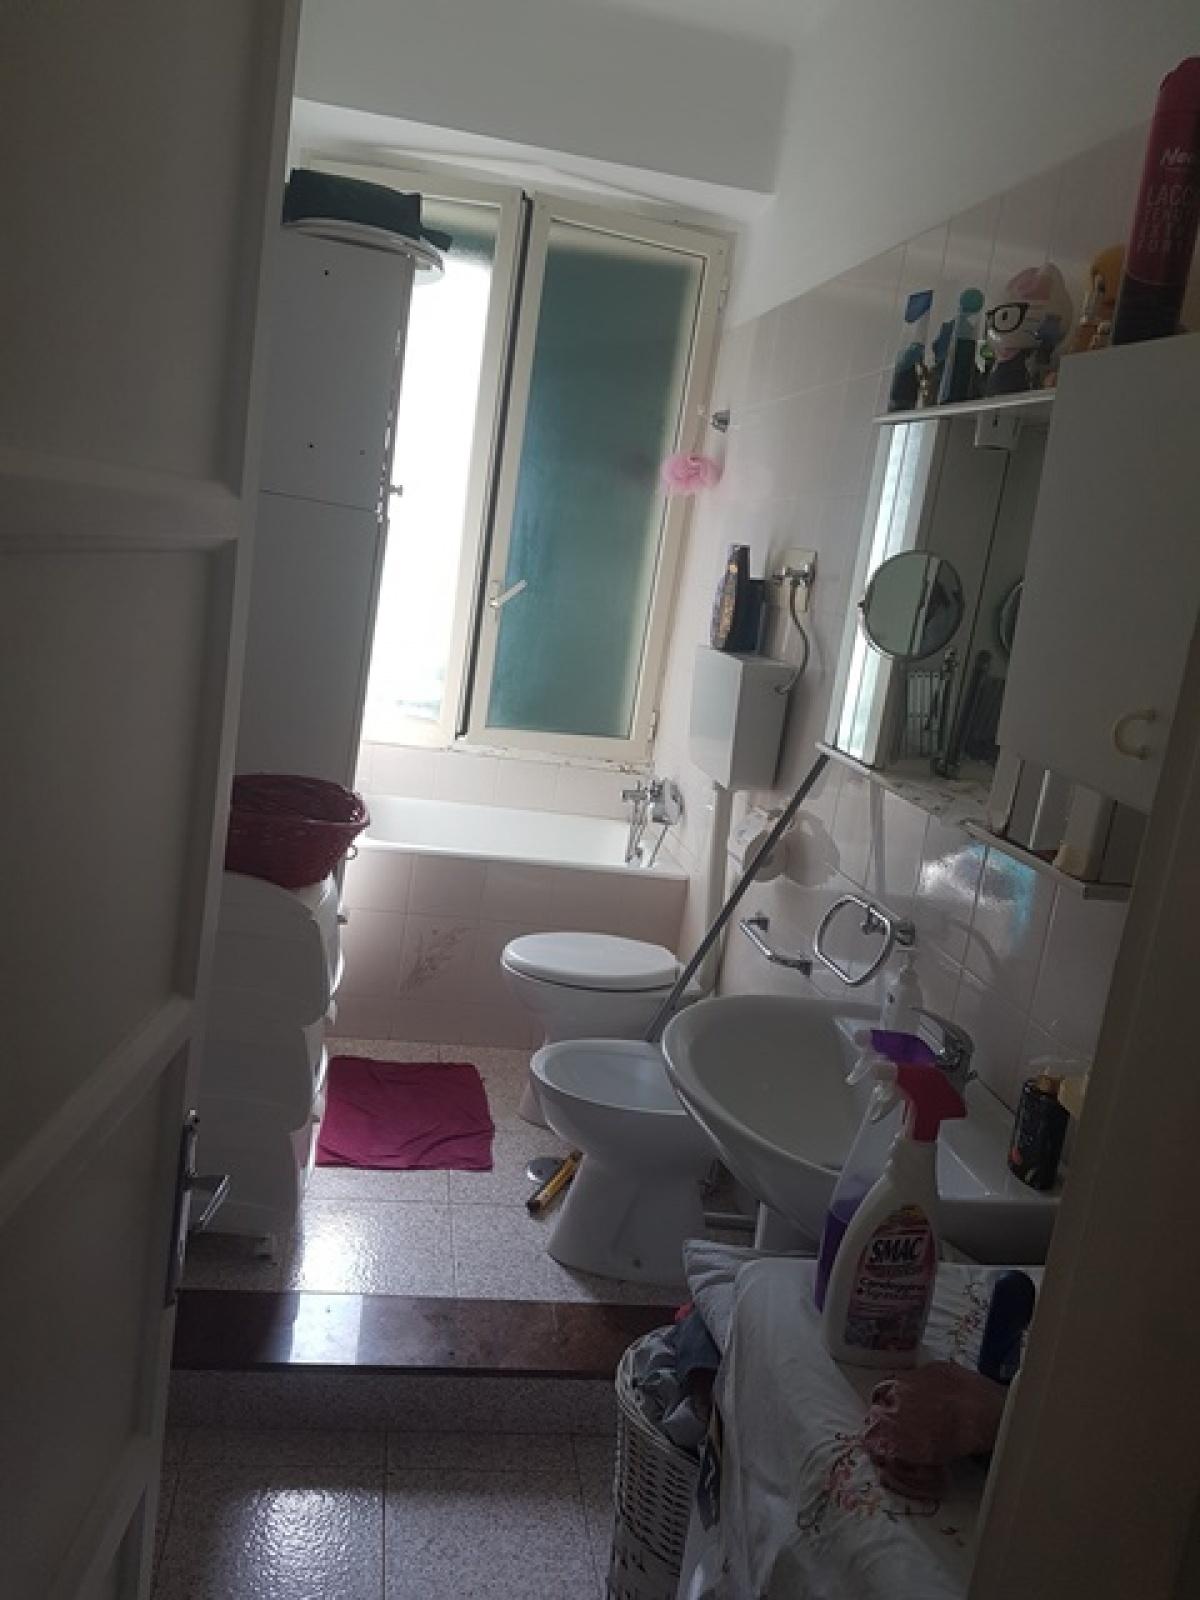 2 Bedrooms Bedrooms, ,1 BagnoBathrooms,Appartamento,VENDITA,1050